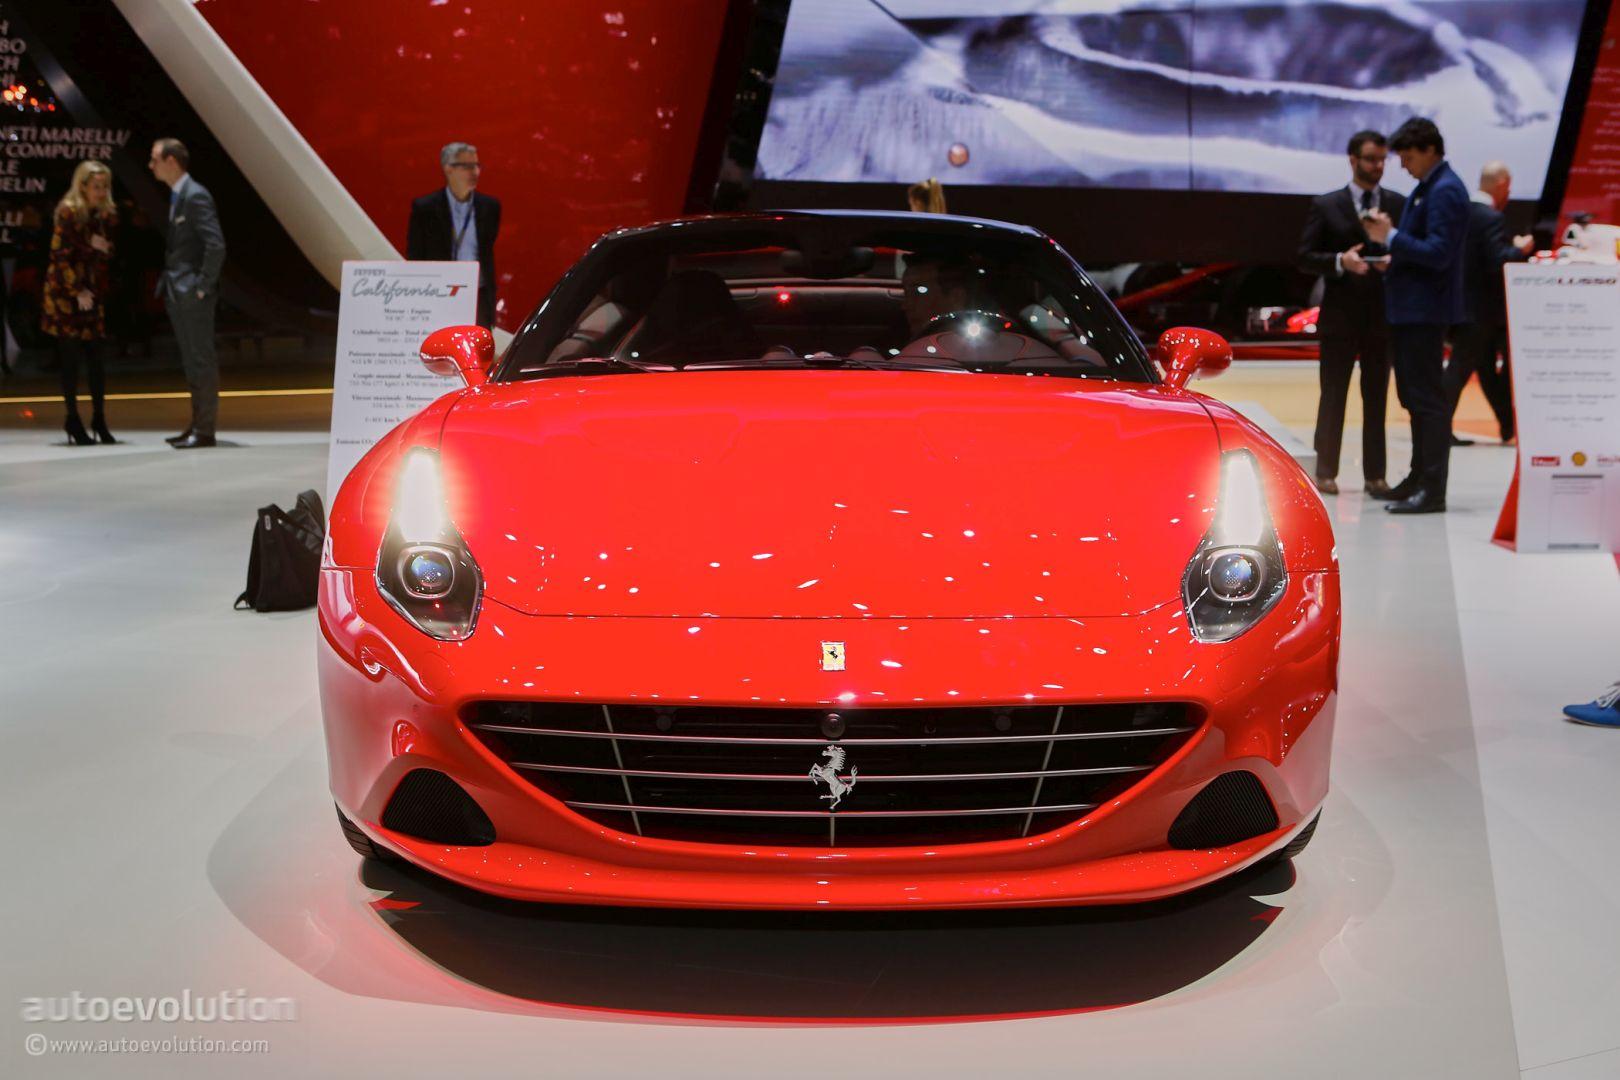 Ferrari california t handling speciale in geneva ferrari california t handling speciale in geneva